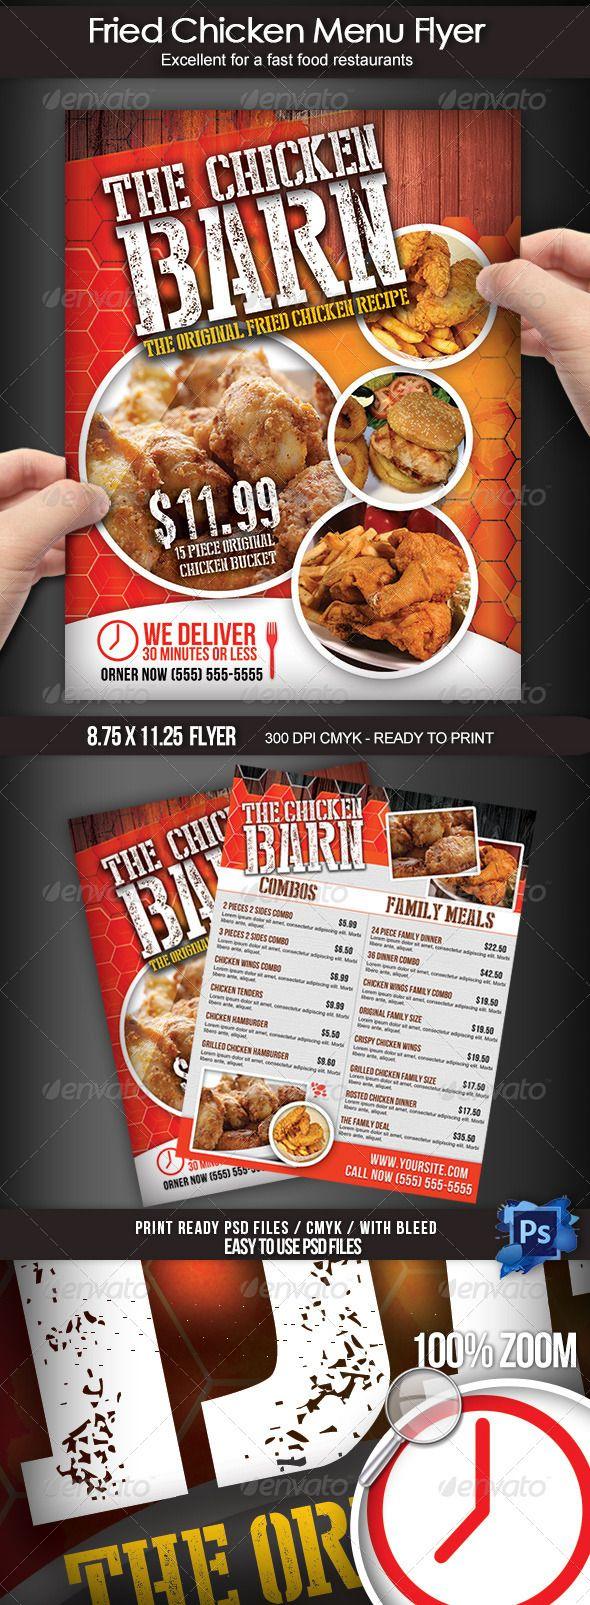 Fried chicken menu flyer chicken menu menu templates for Alaska fish and chicken menu